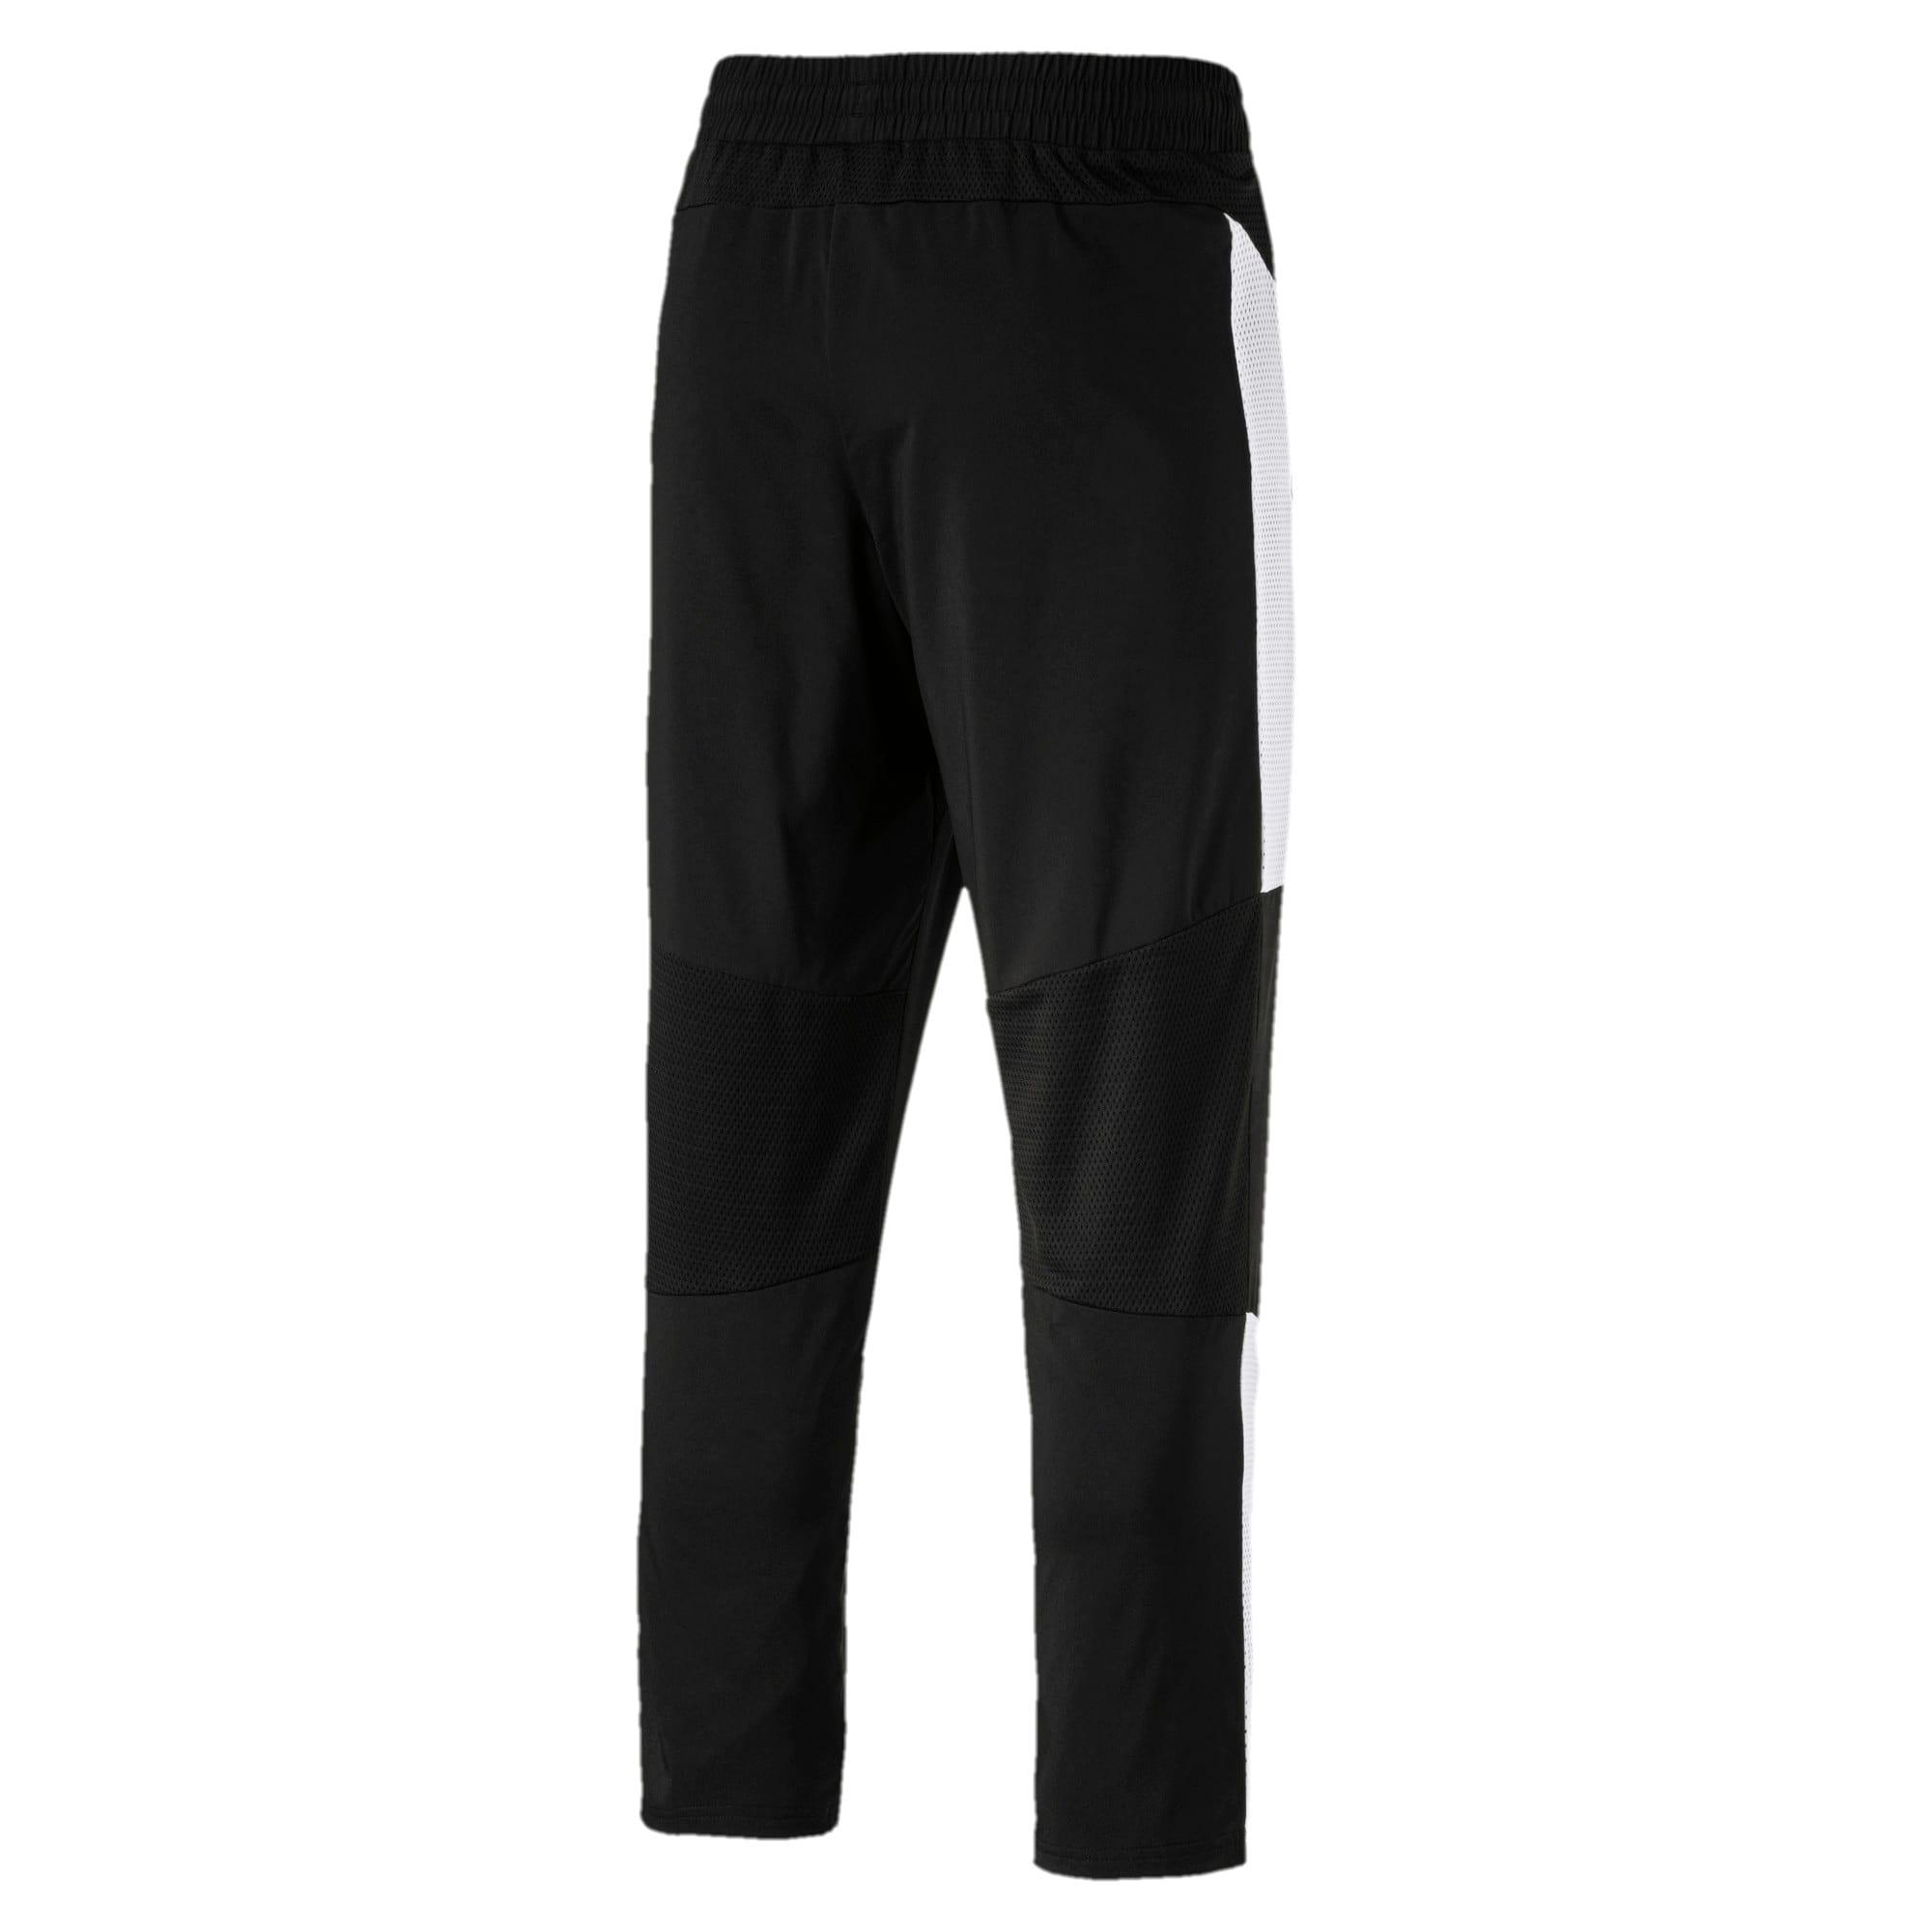 Thumbnail 3 of Energy Blaster Men's Woven Pants, Puma Black-Puma White, medium